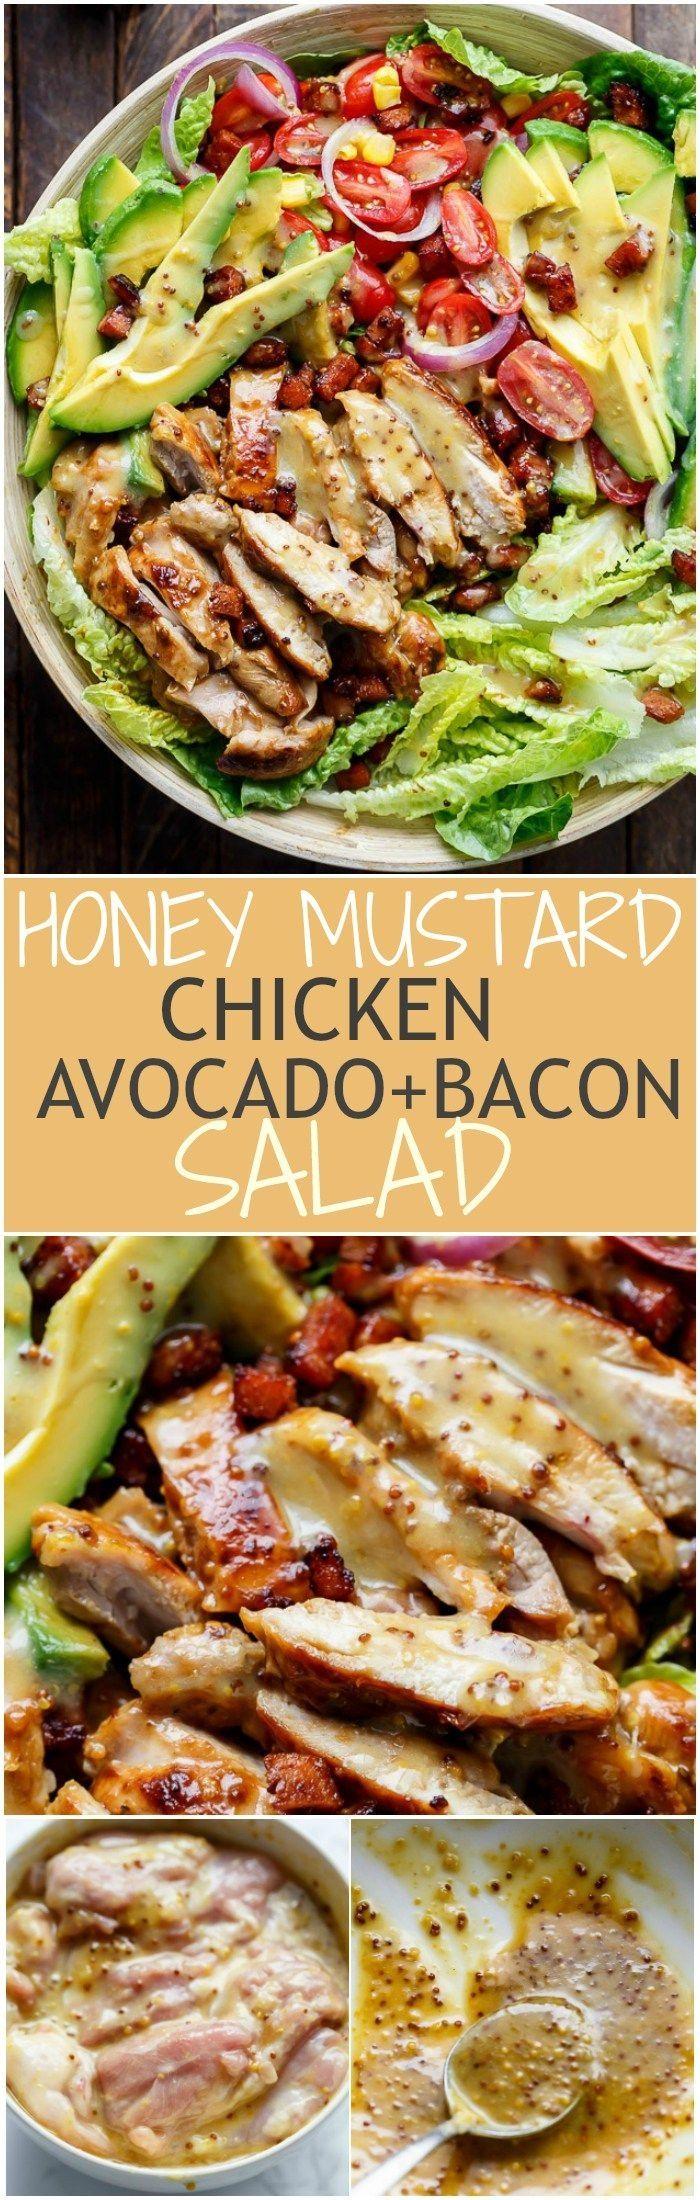 cool Honey Mustard Chicken, Avocado Bacon Salad - Cafe Delites #weightloss